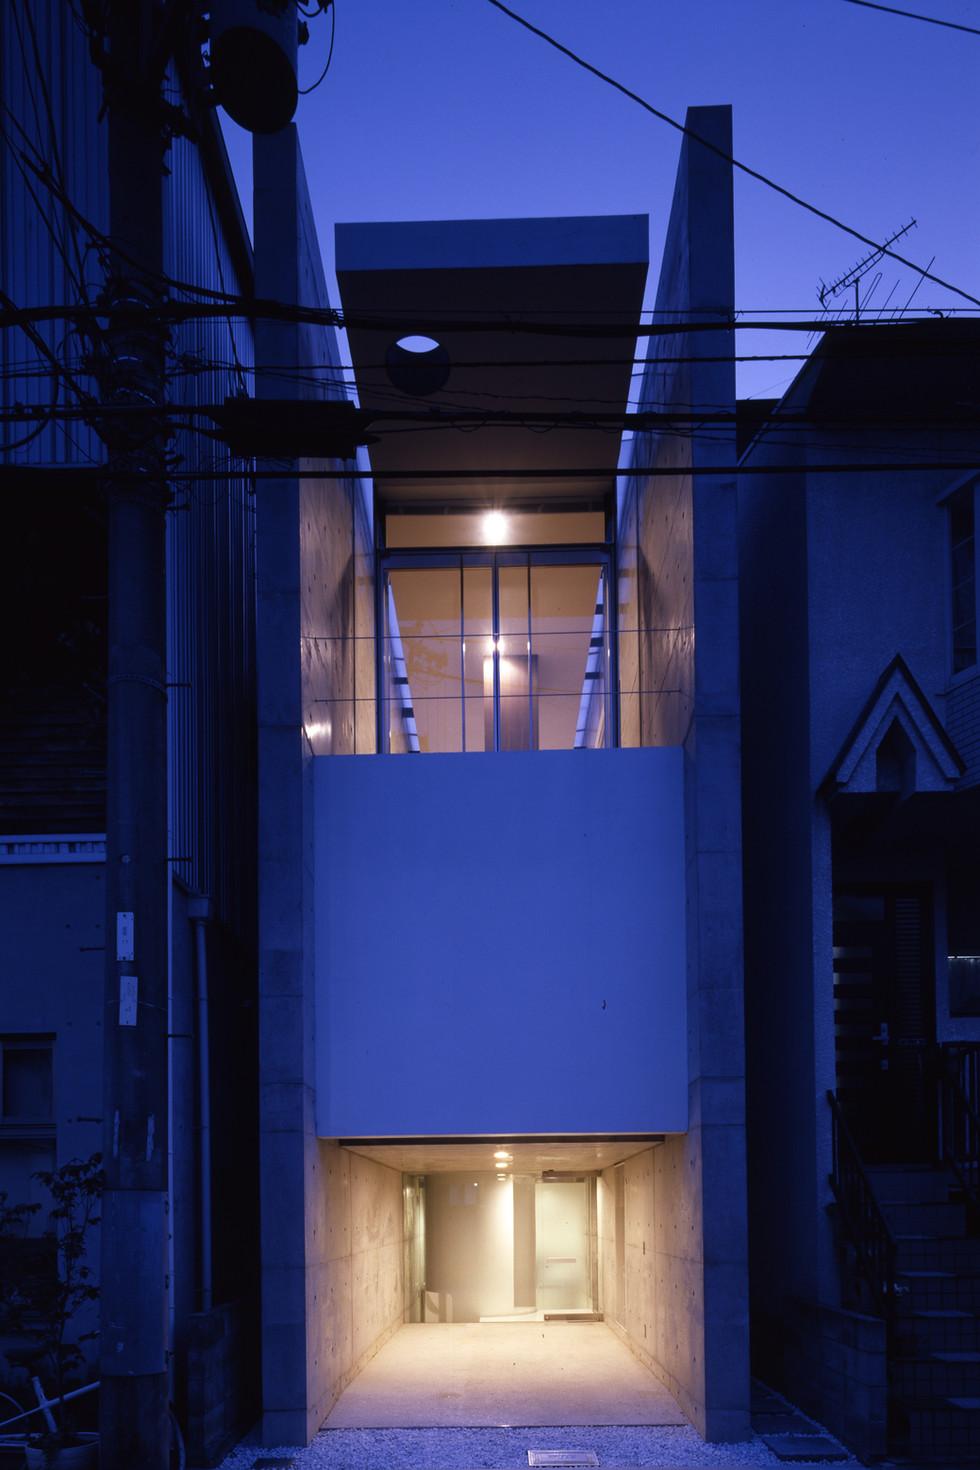 katura01021.jpg